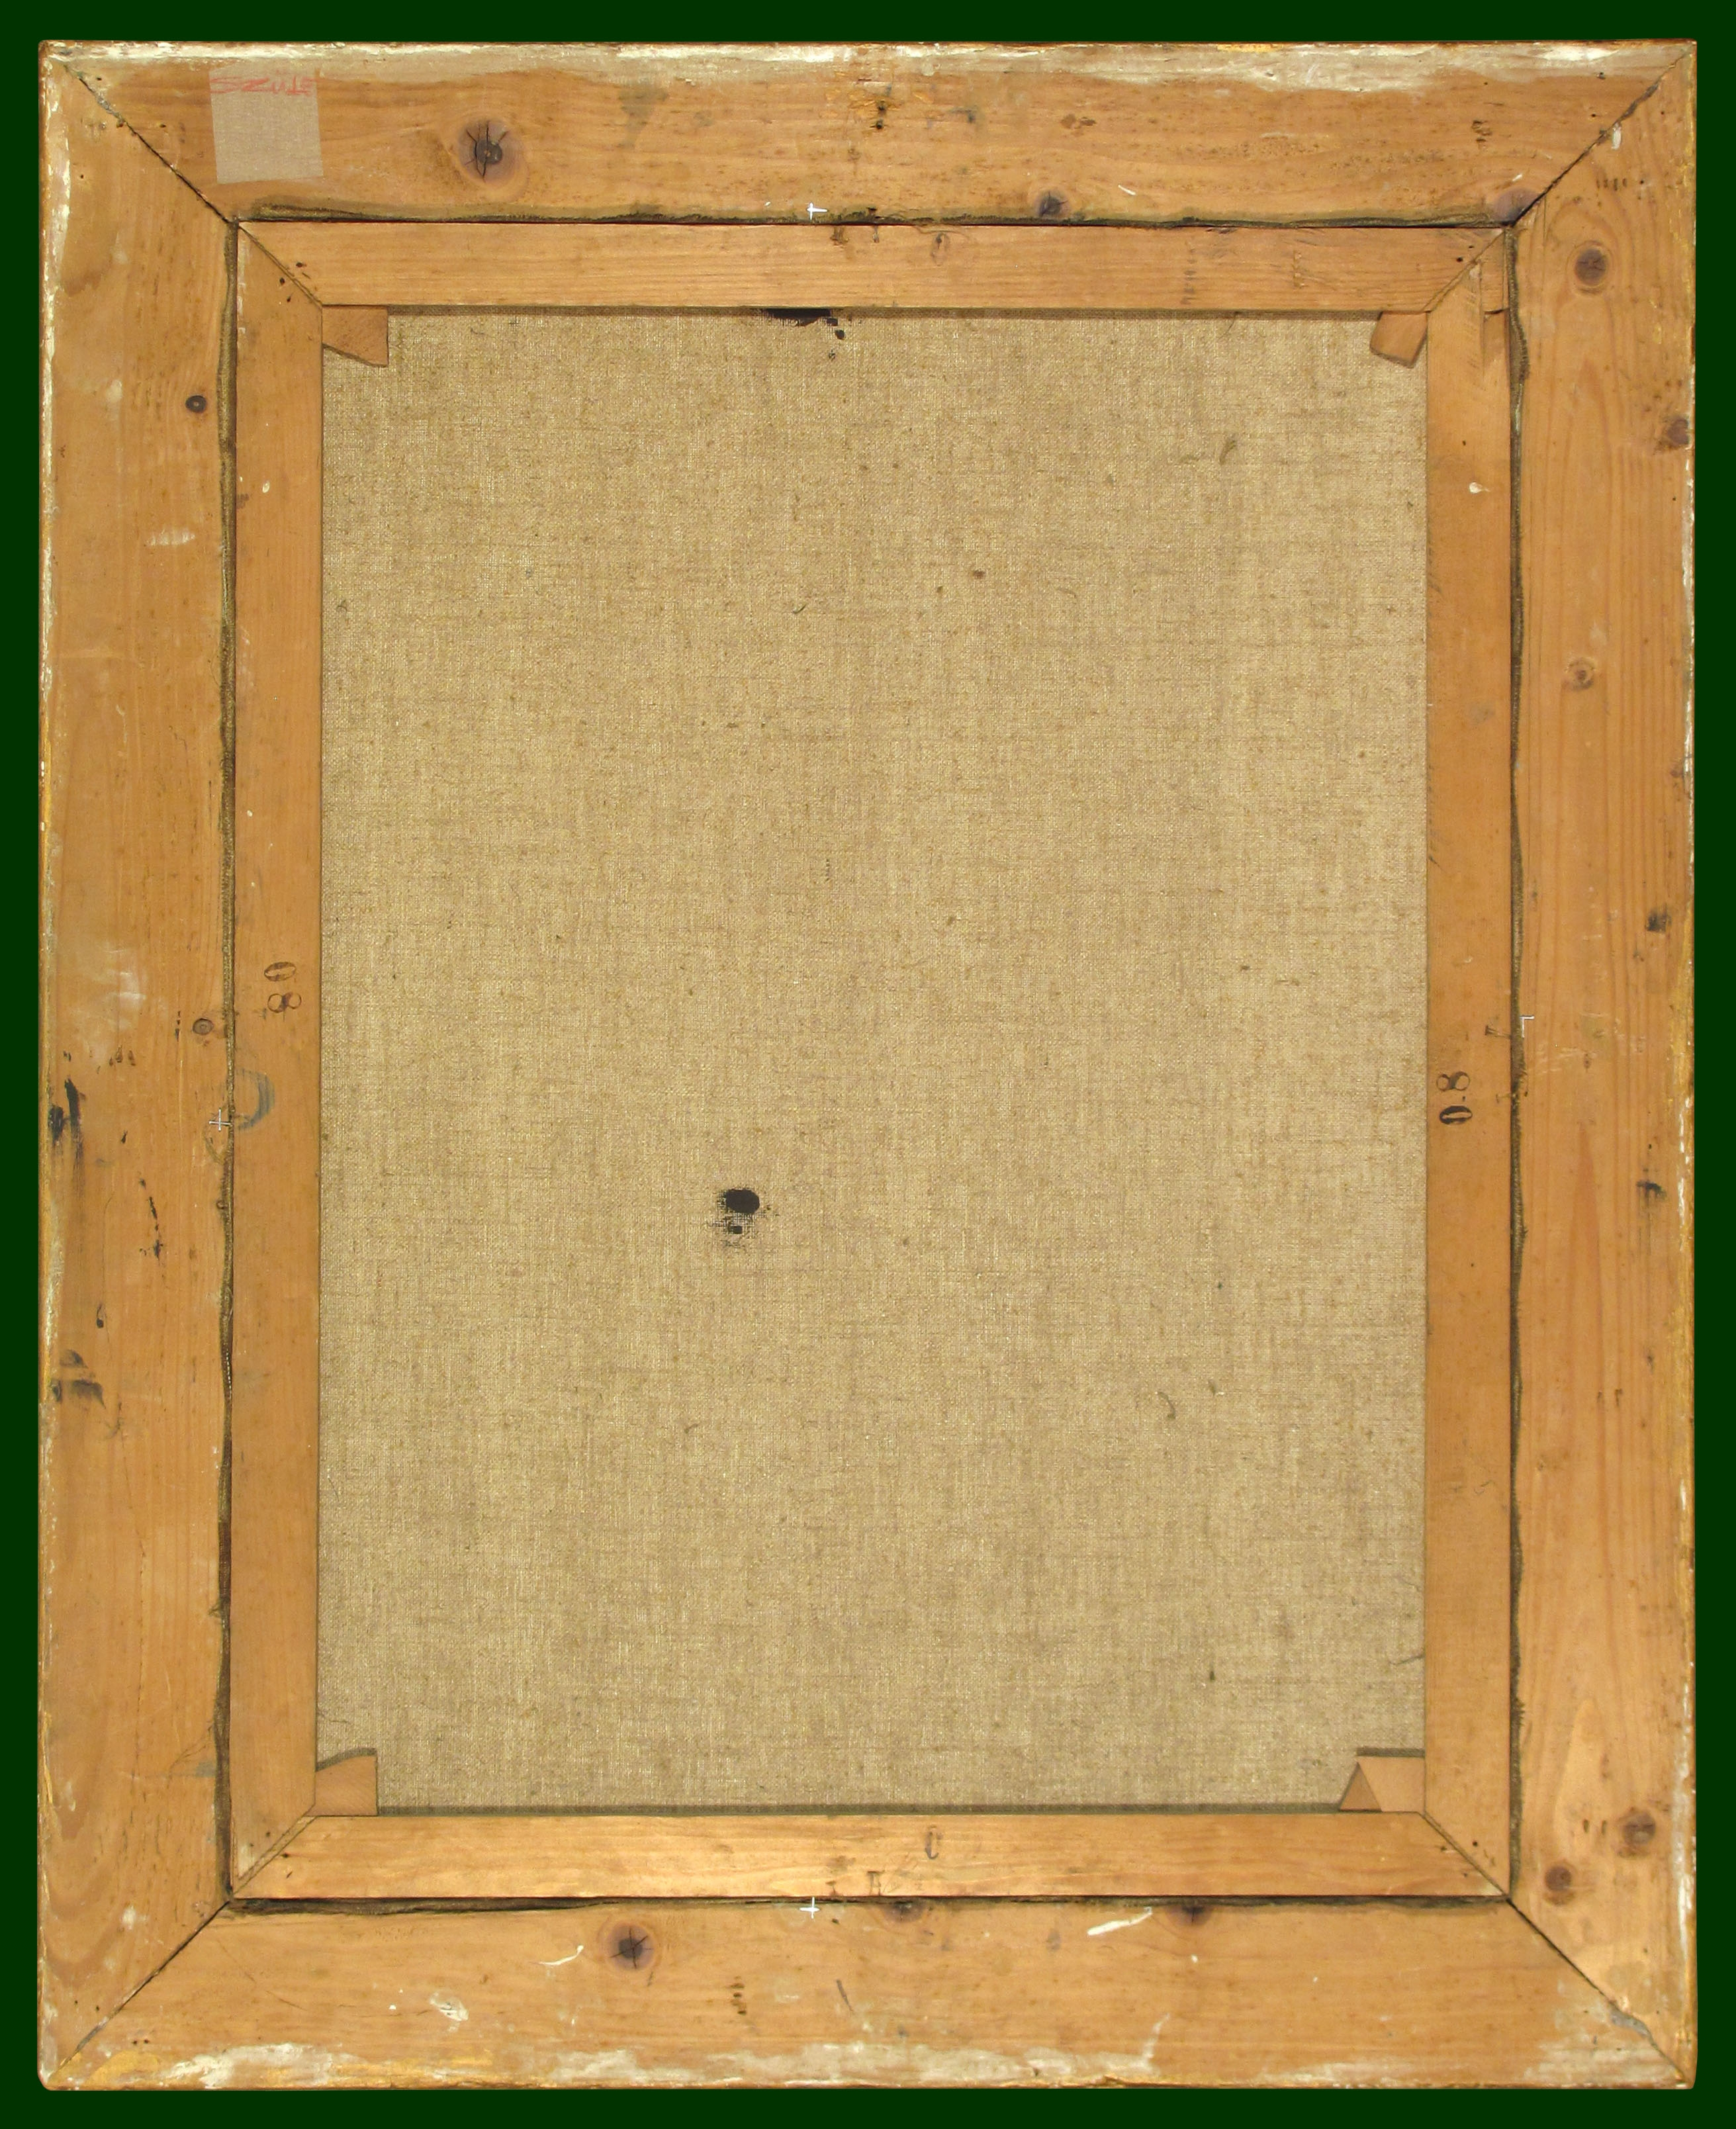 71-2hát.jpg (2623×3217)